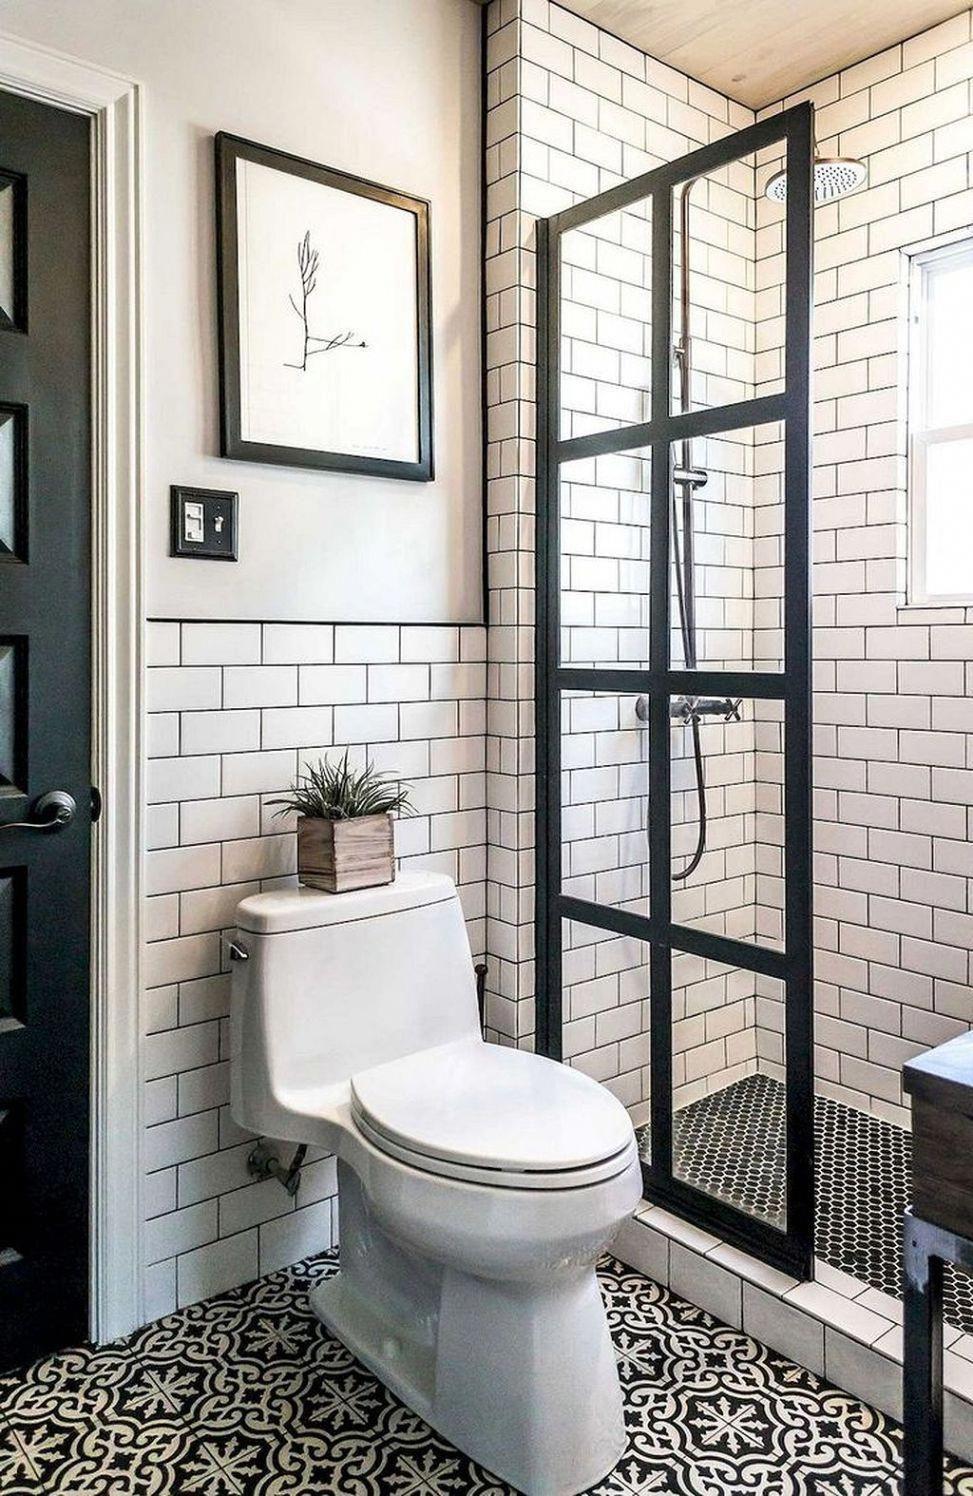 Bathroom Ideas For Bloxburg Small Bathroom Remodel Bathroom Design Small Small Master Bathroom